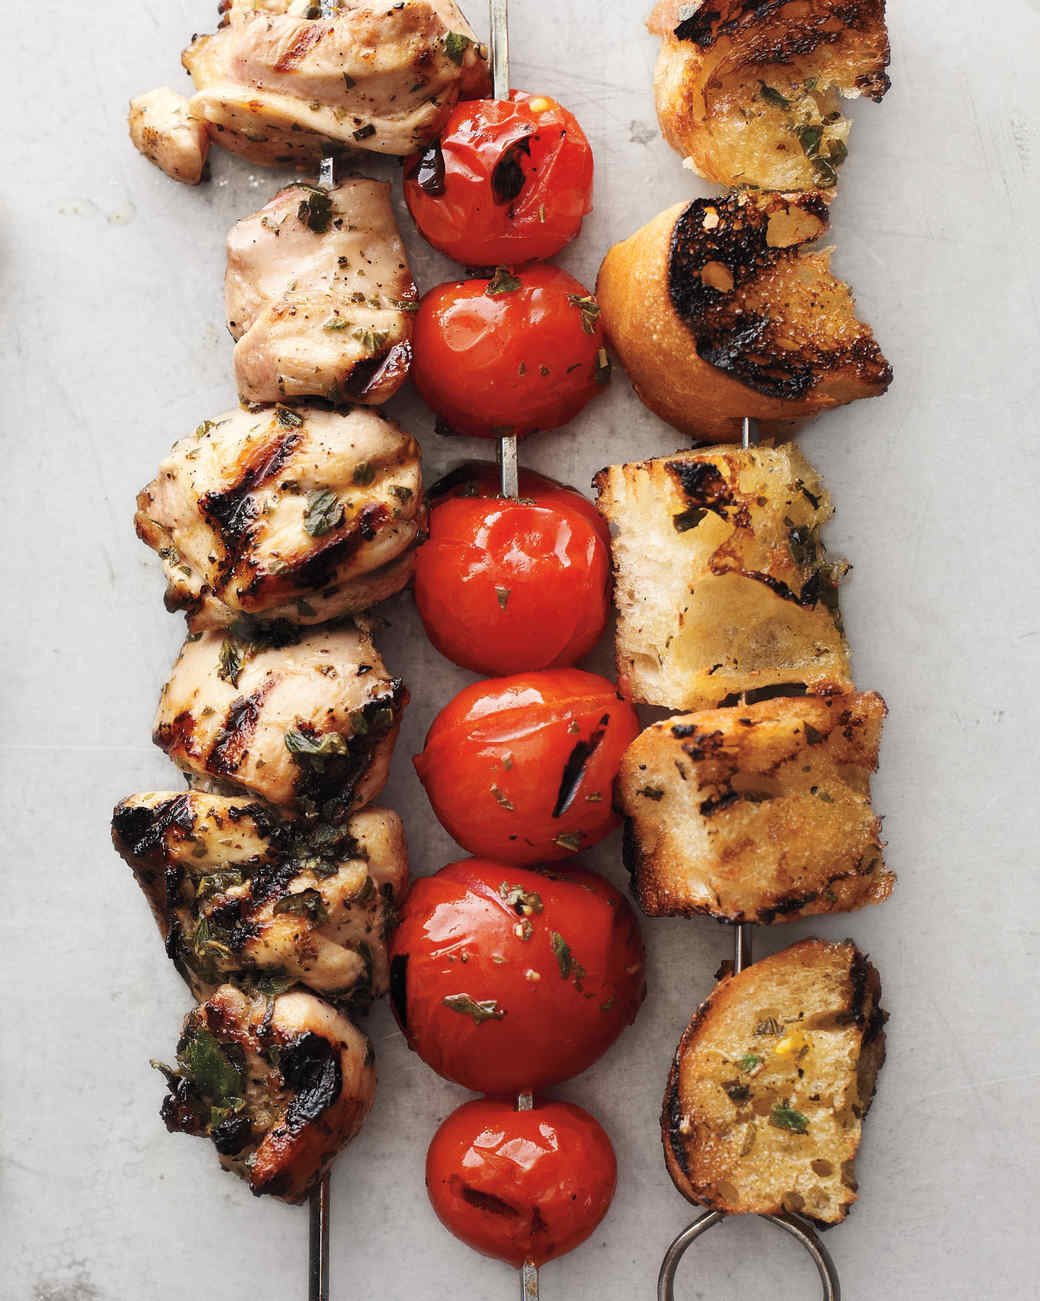 Chicken, Tomato and Bread Cubes with Lemon-Oregano Marinade